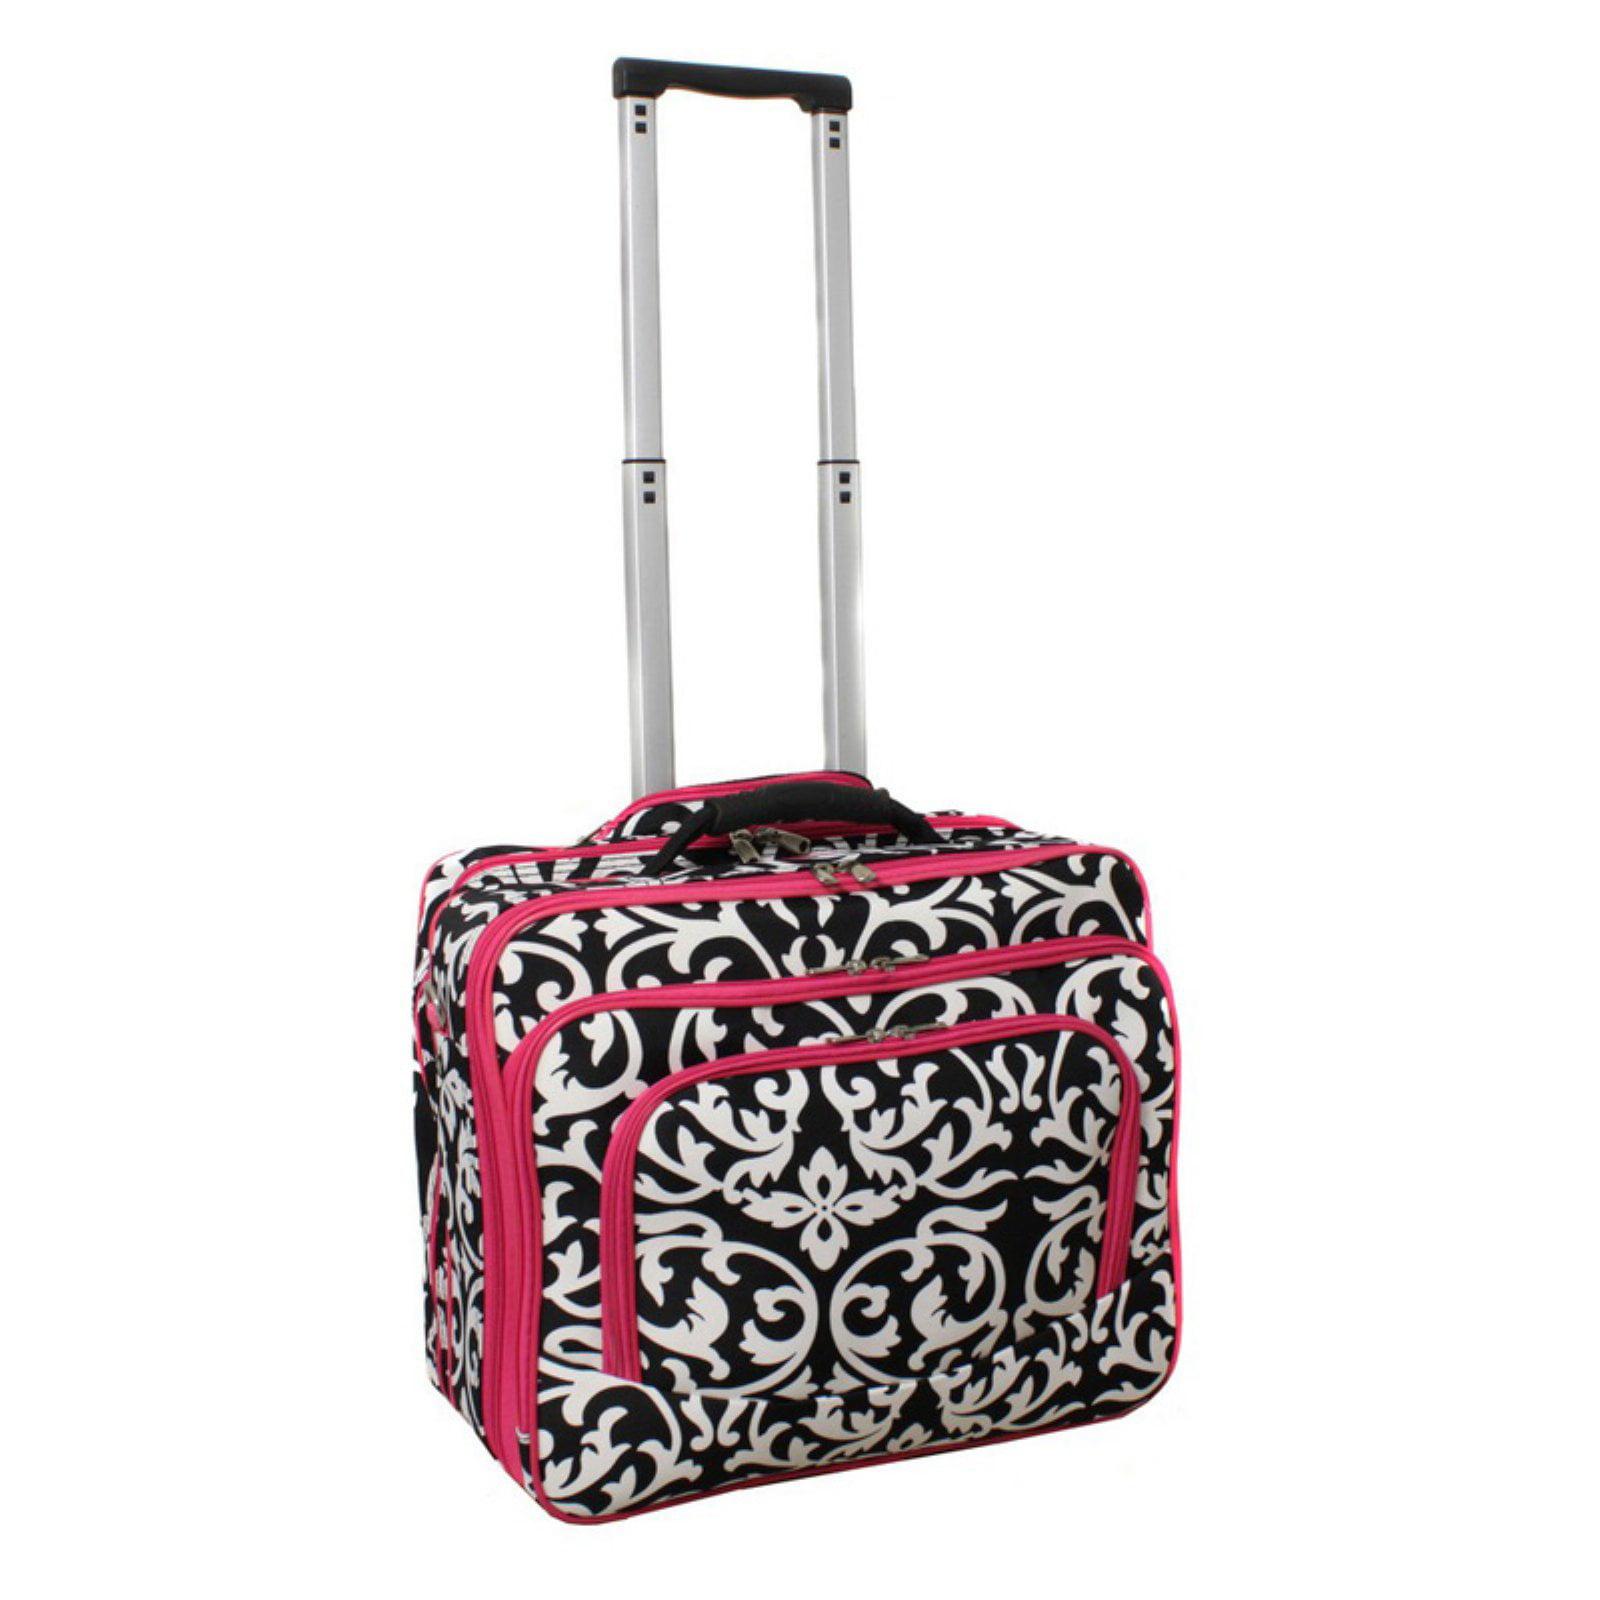 World Traveler Damask Rolling 17 in. Laptop Case by World Traveler